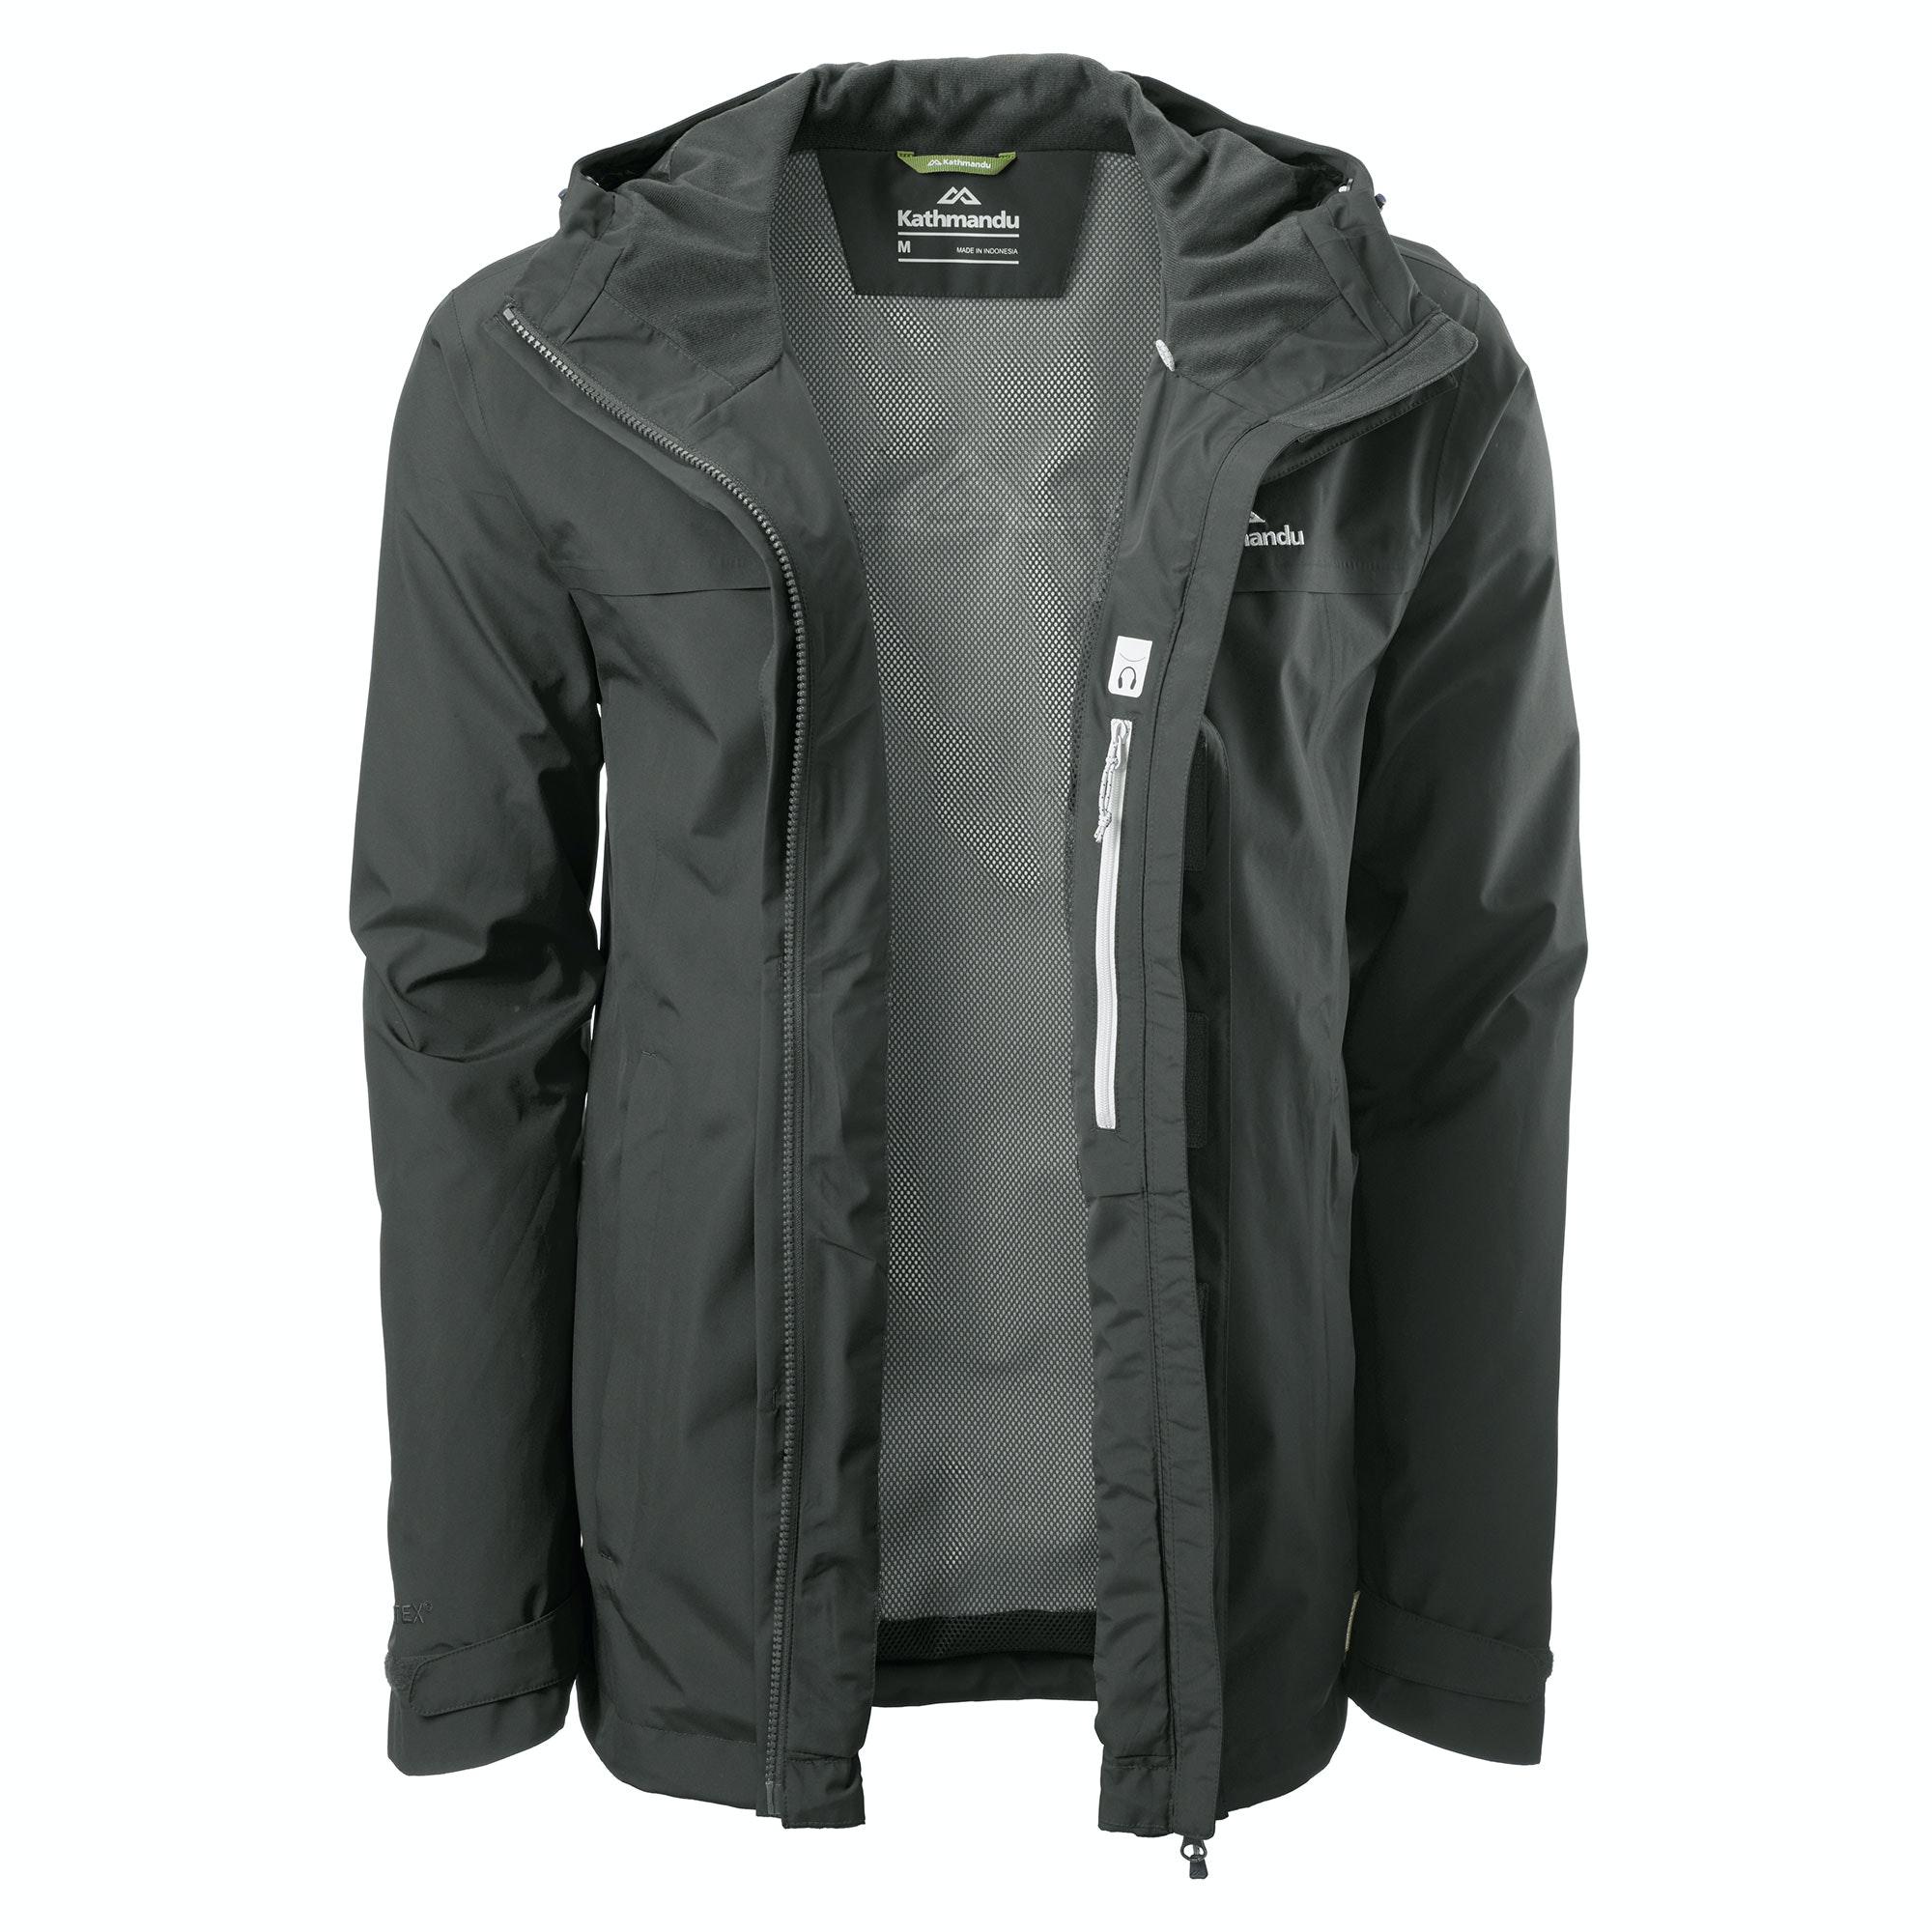 NEW-Kathmandu-Bealey-Men-039-s-GORE-TEX-Windproof-Waterproof-Outdoor-Rain-Jacket